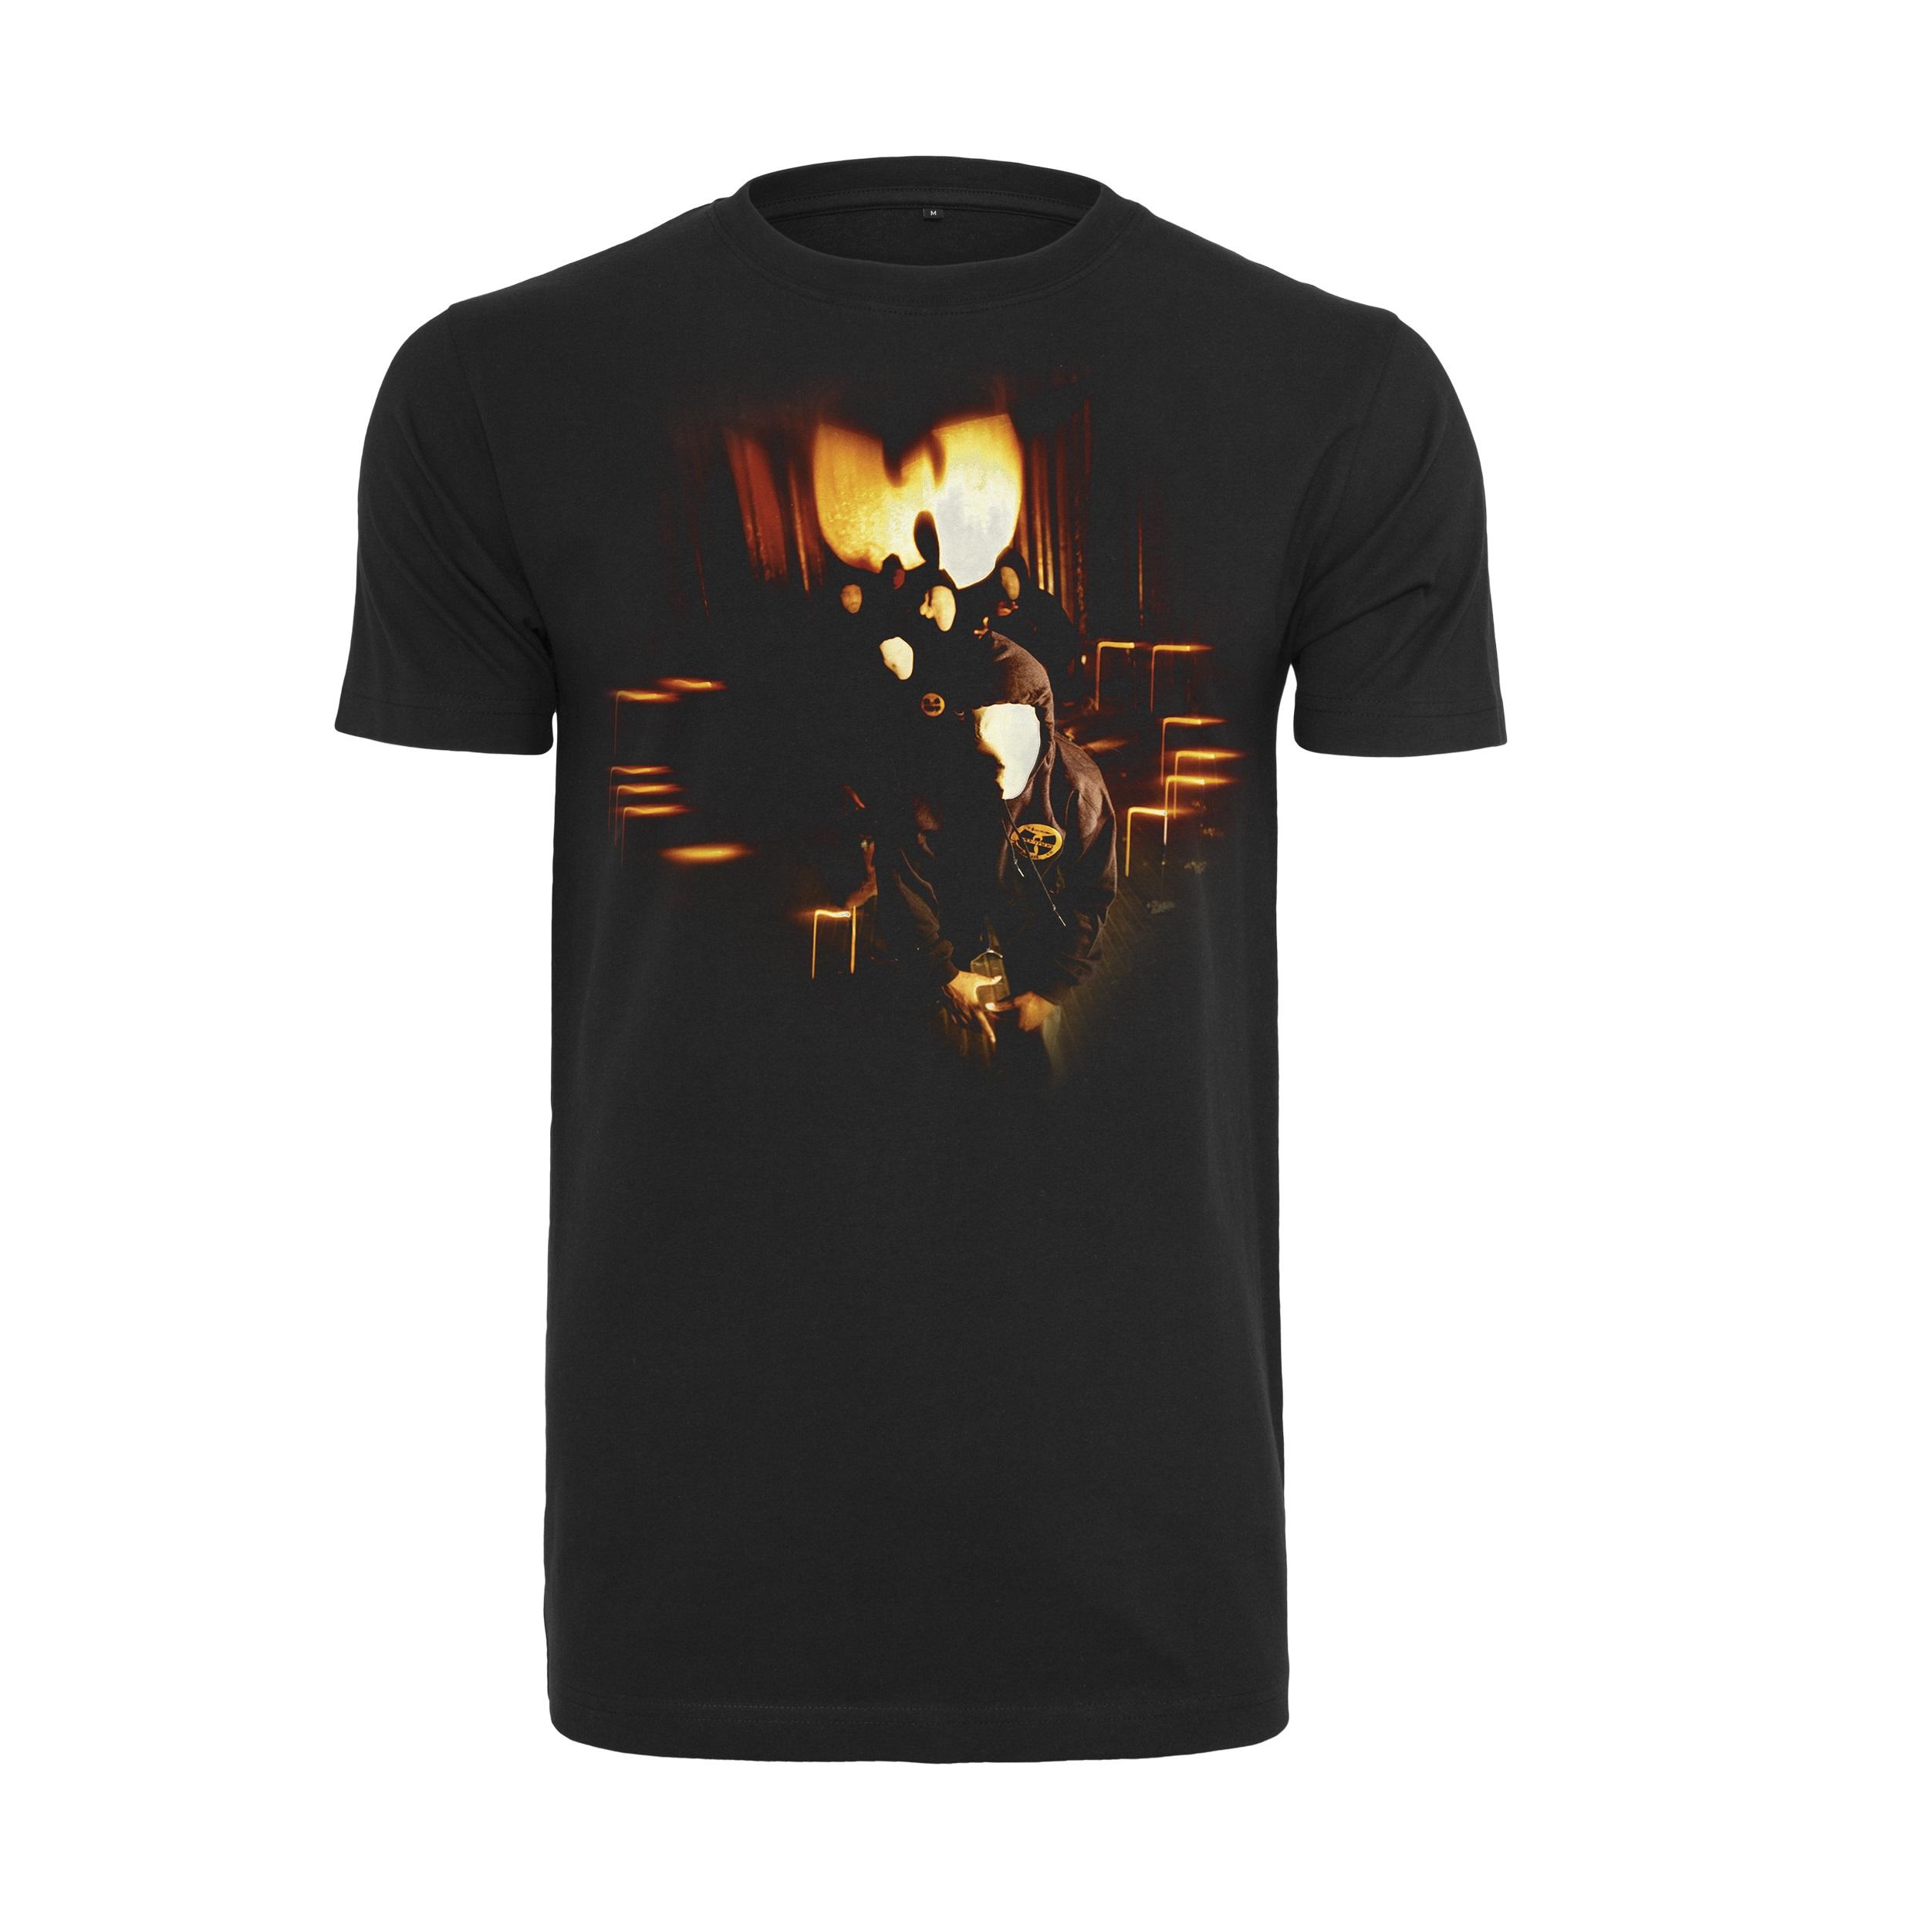 Wu-Tang Clan - Tričko Masks Tee - Muž, Čierna, S